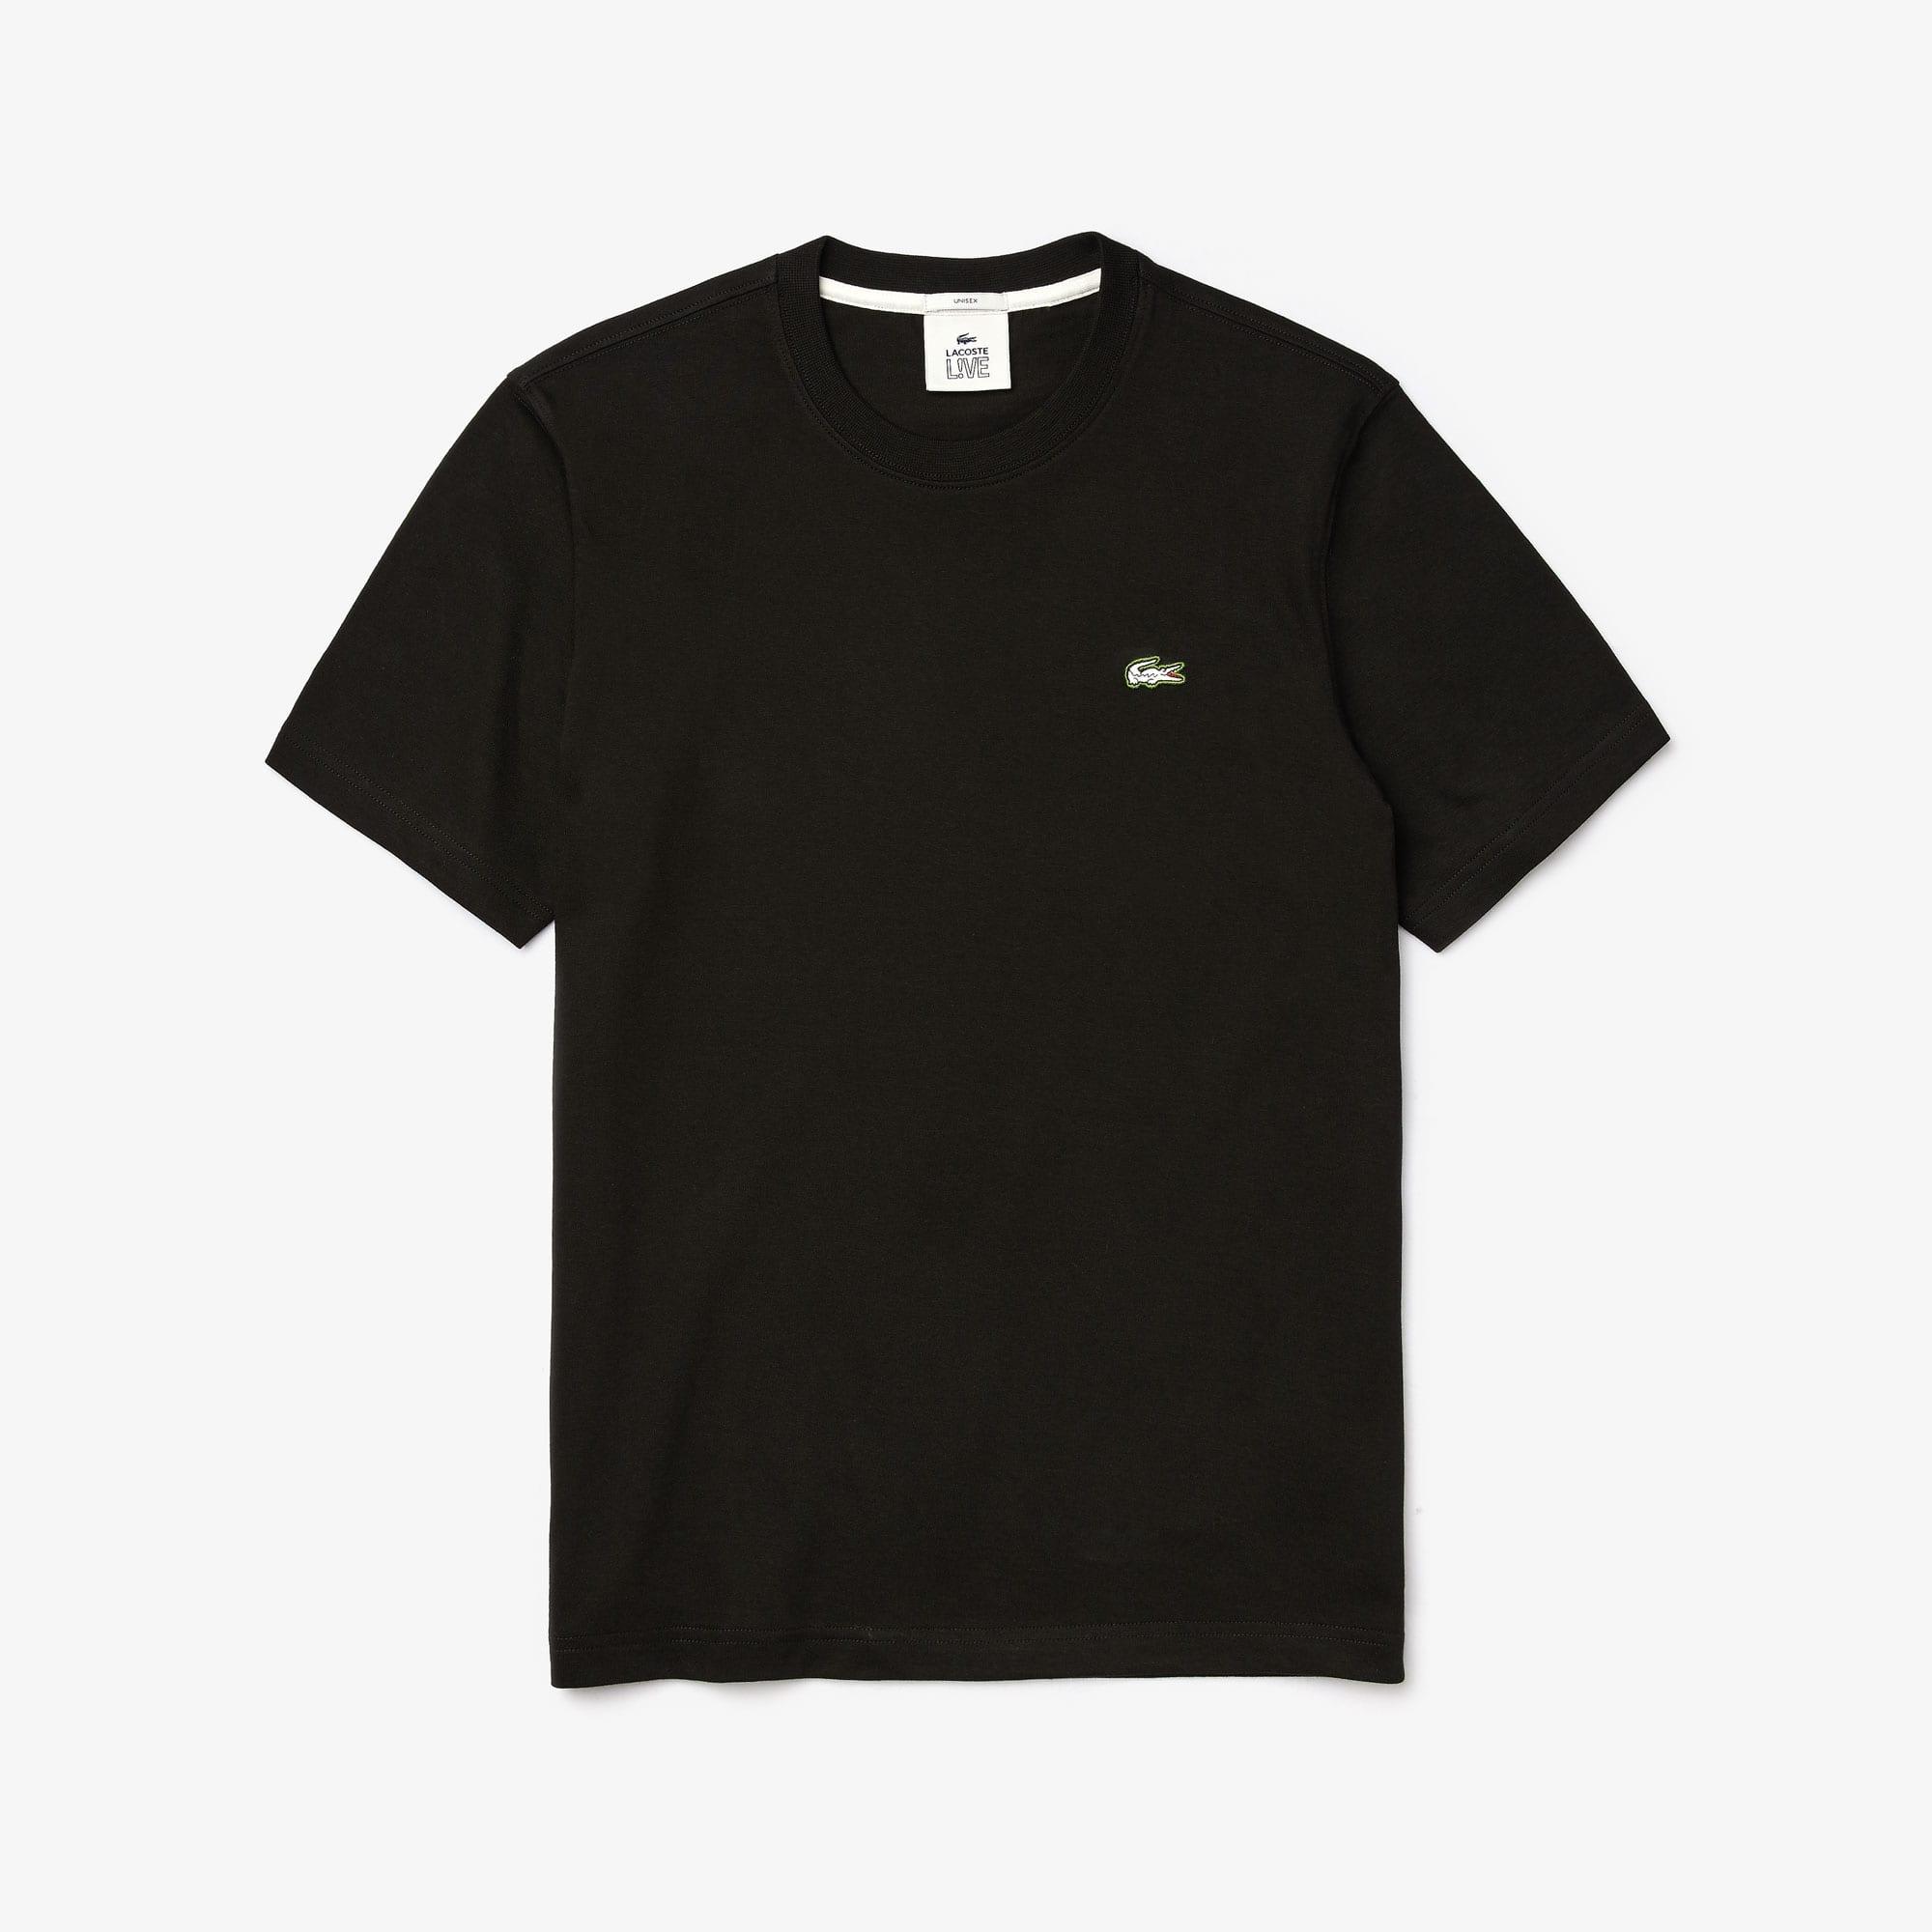 Unisex LACOSTE L!VE Baumwoll-T-Shirt